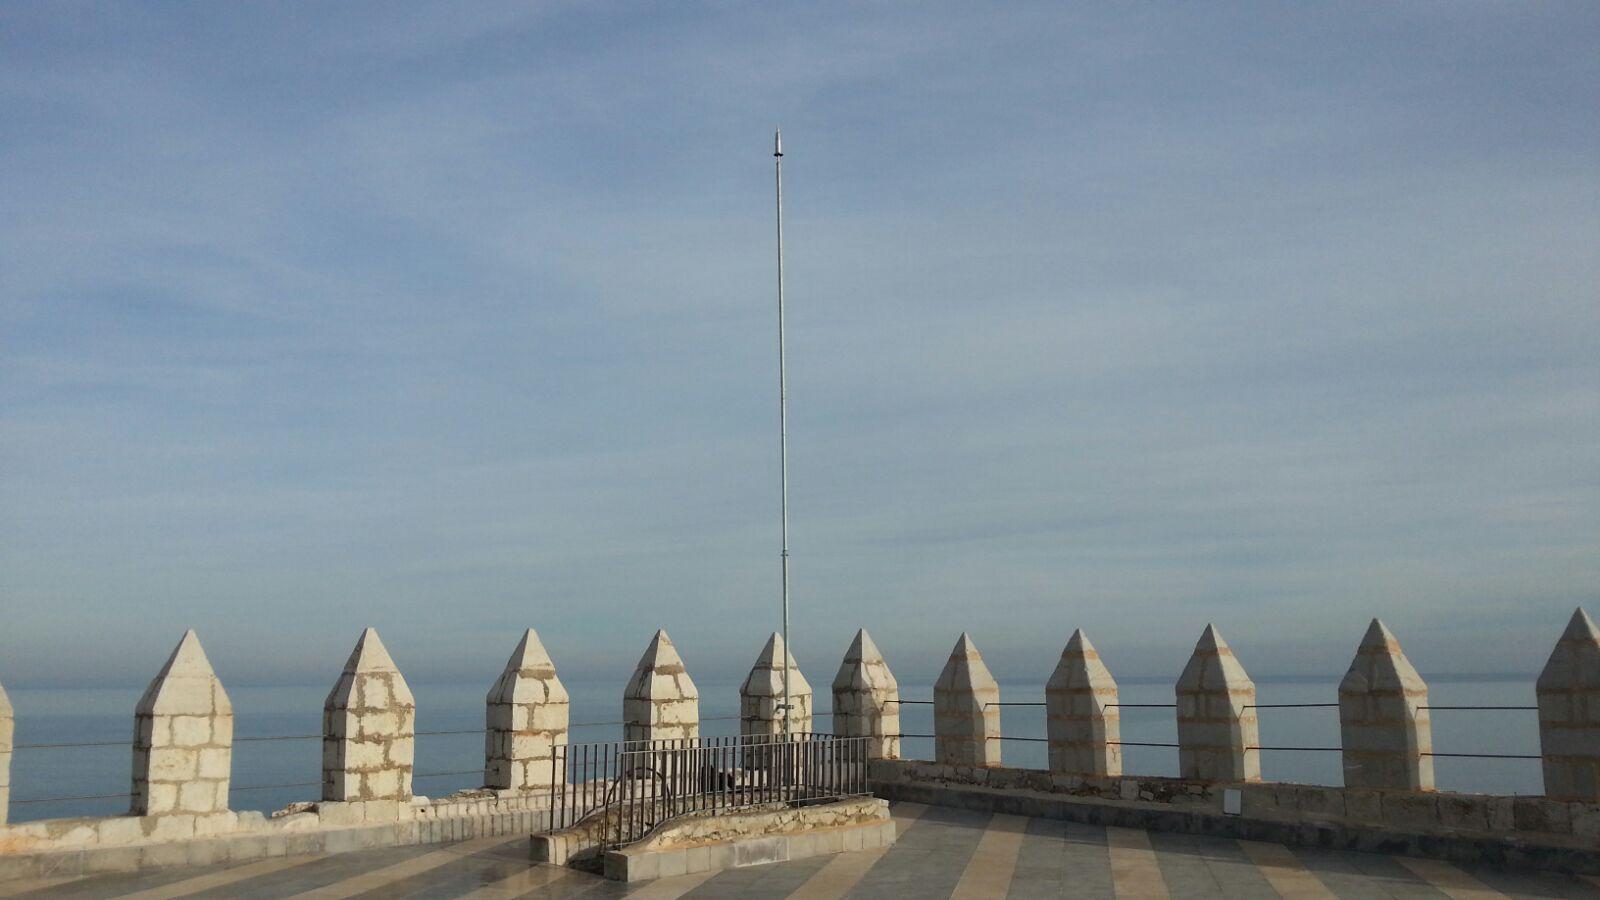 Aplicaciones Tecnológicas, S.A. protège le château de Peniscola de la foudre